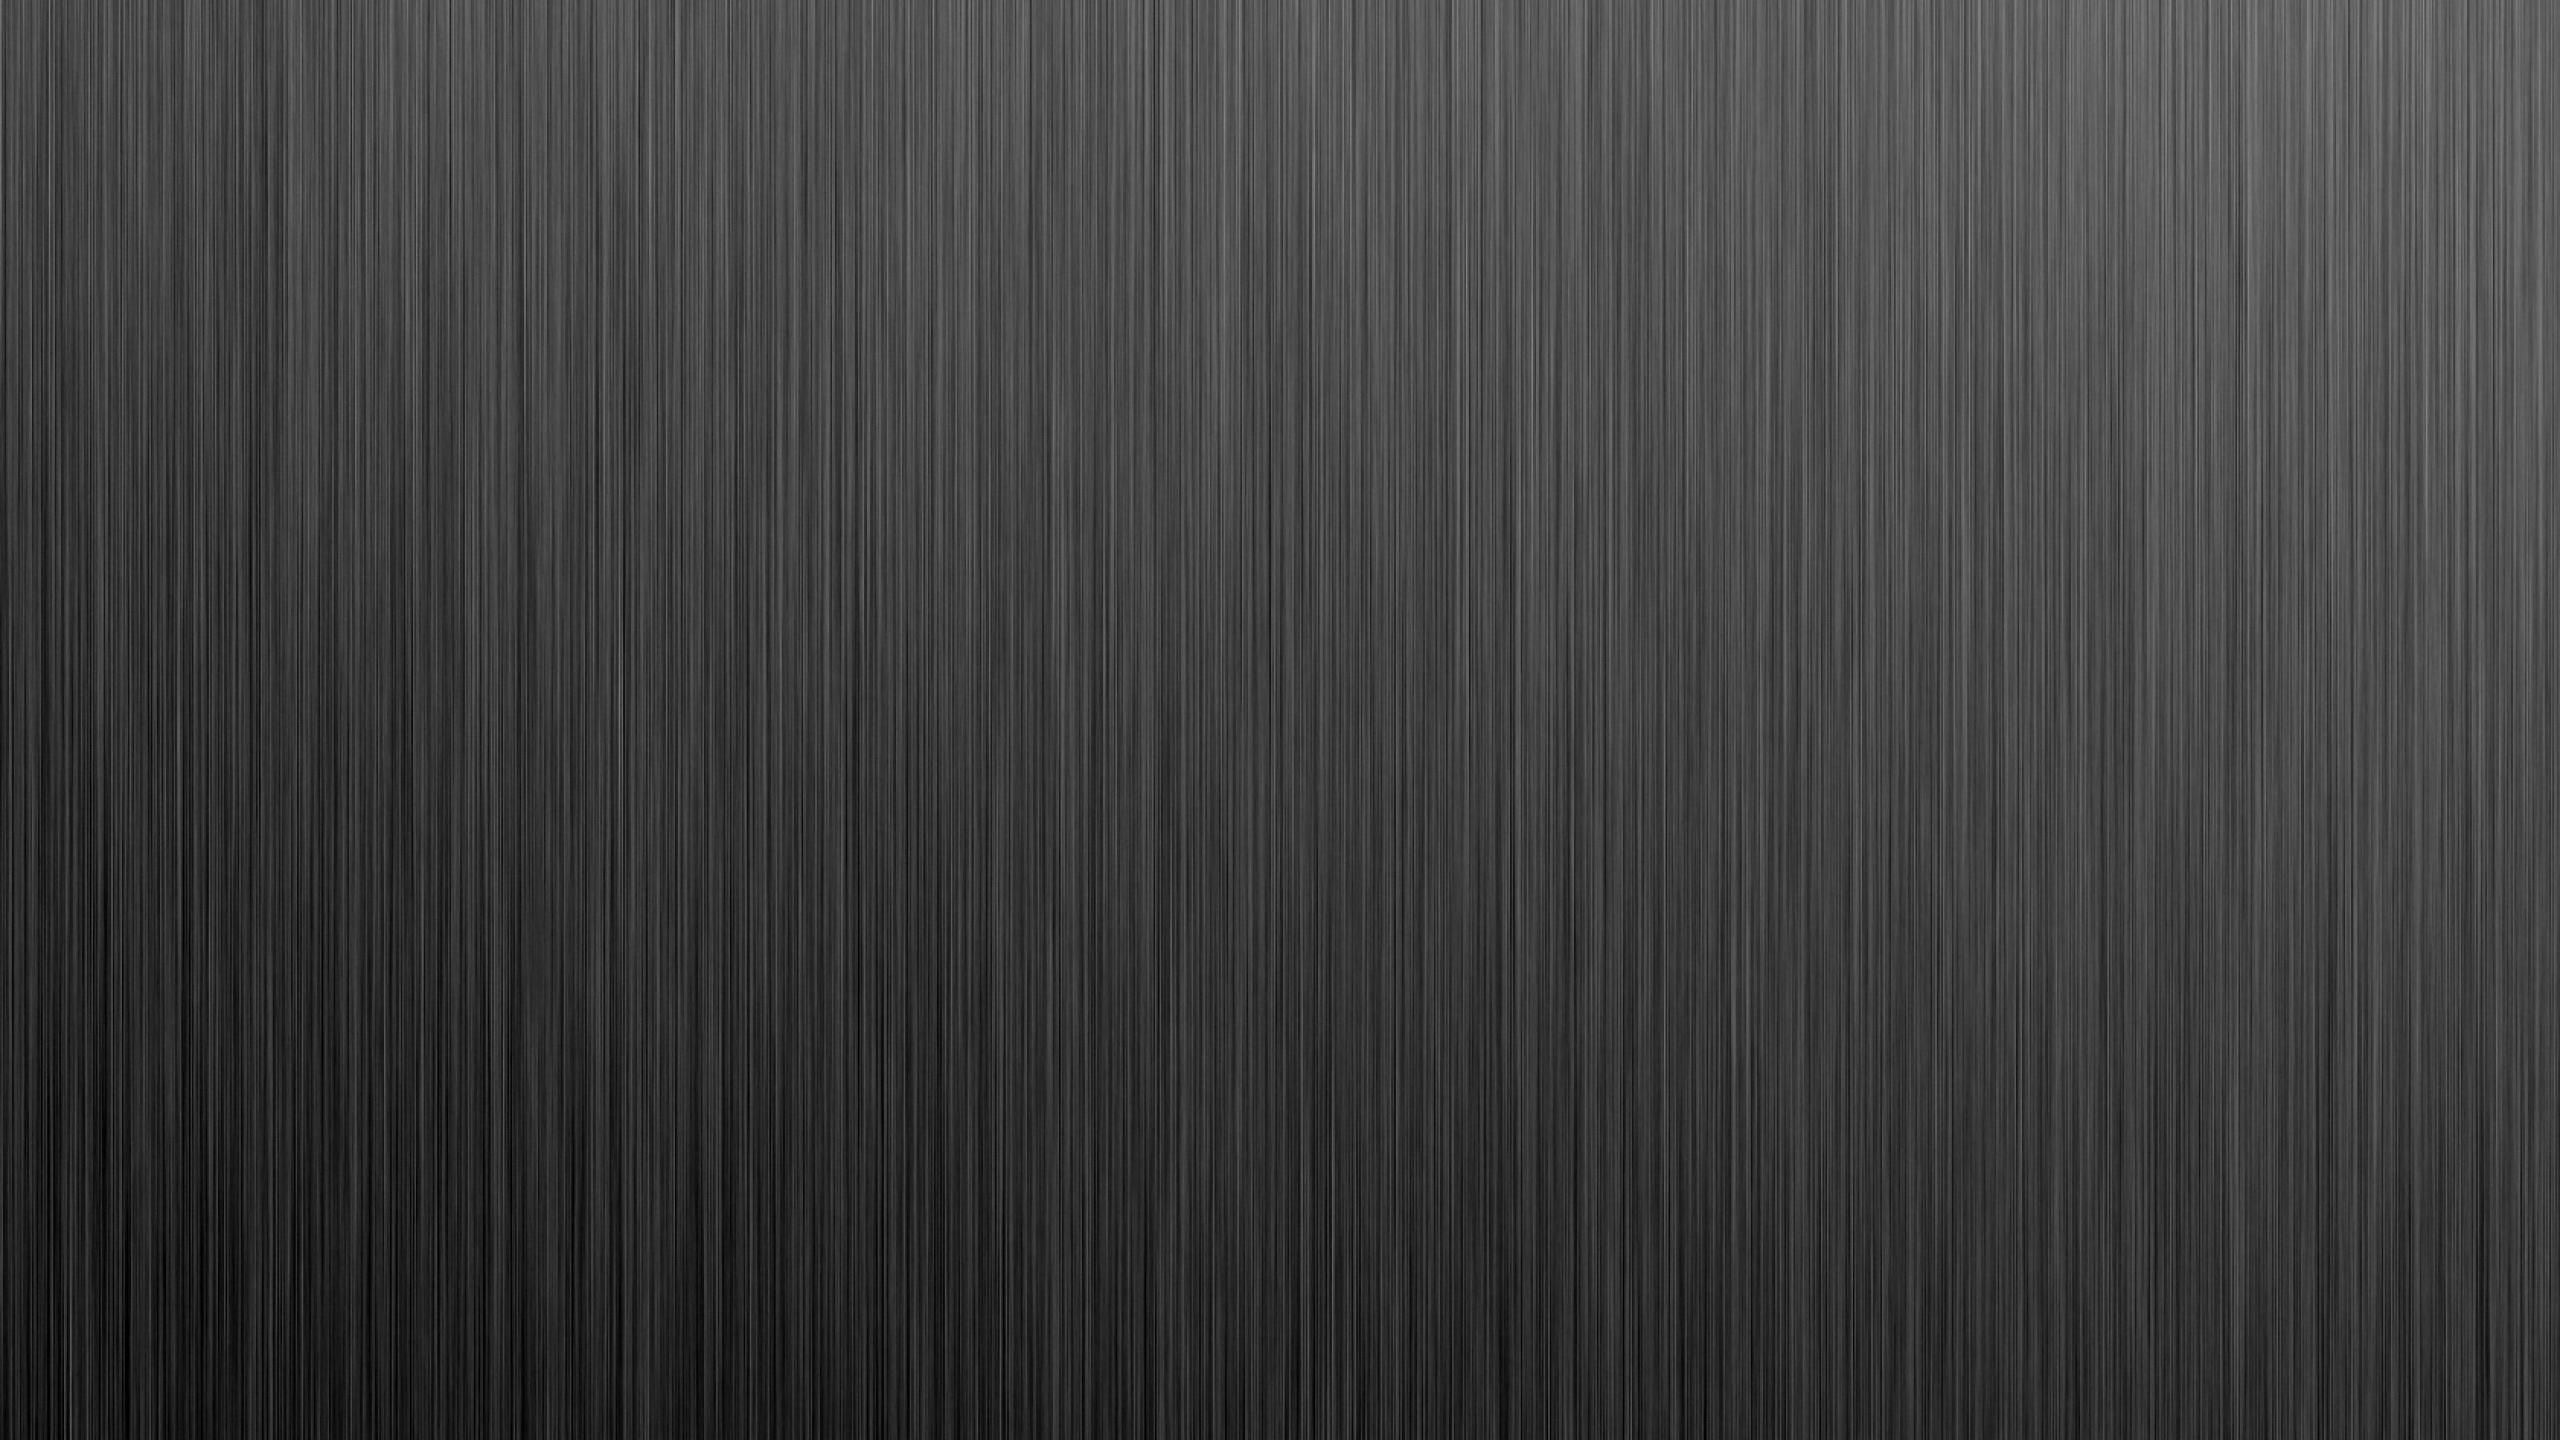 Aluminum Widescreen Wallpaper Wallpaper Desktop Images Background Photos Download Hd Free Windows Wallpaper Samsung 2560 1440 Pt Mulia Karya Berkah Bersama Pt Mk88